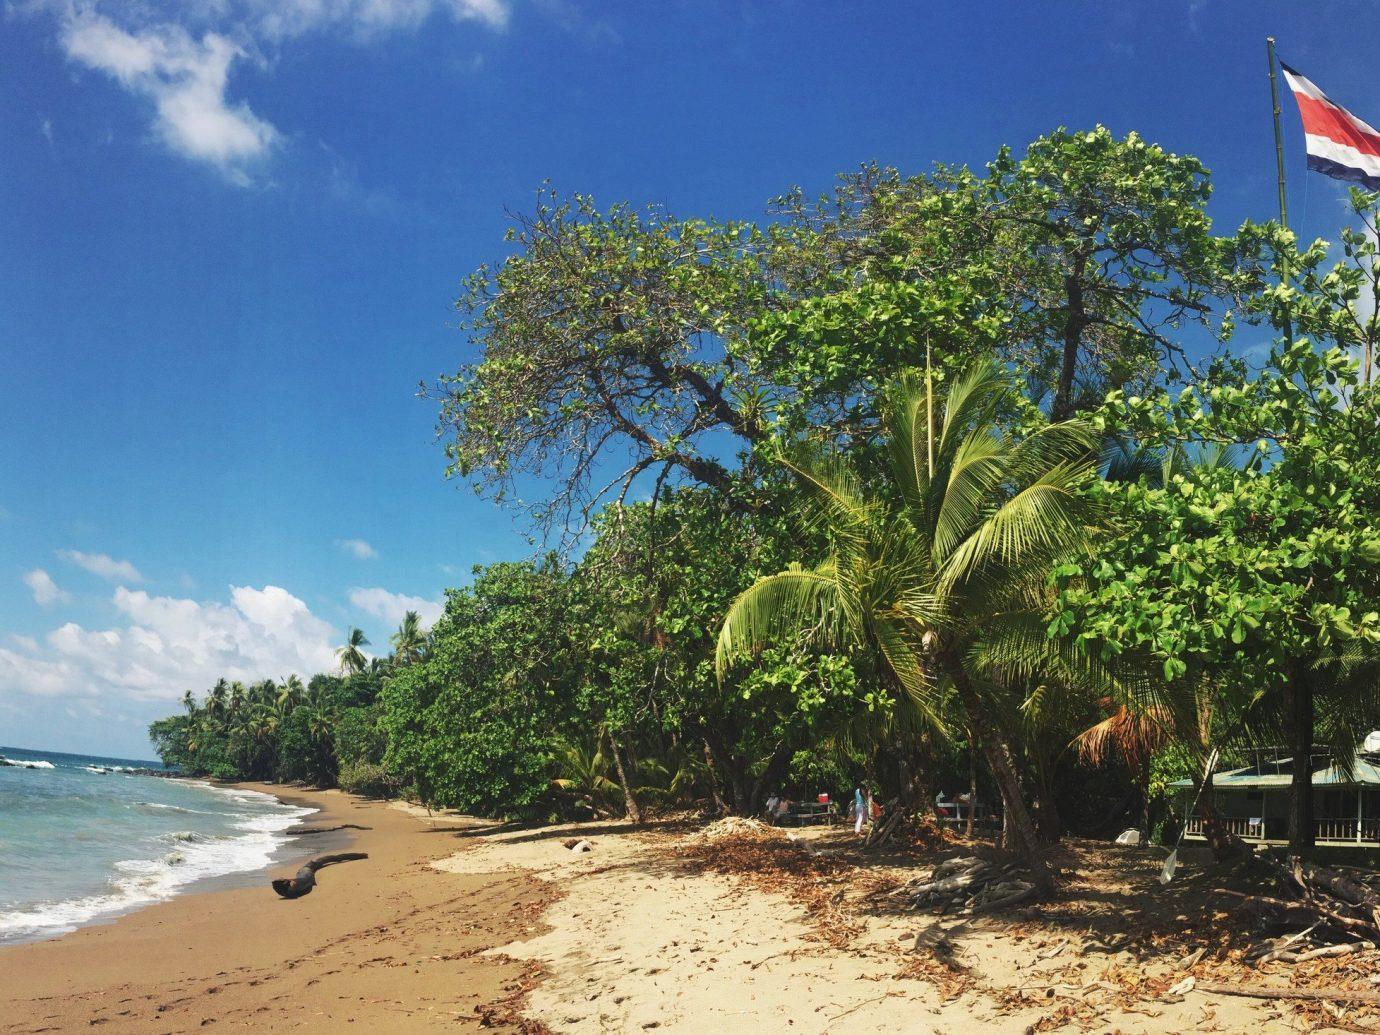 Beach on the Osa Peninsula in Costa Rica